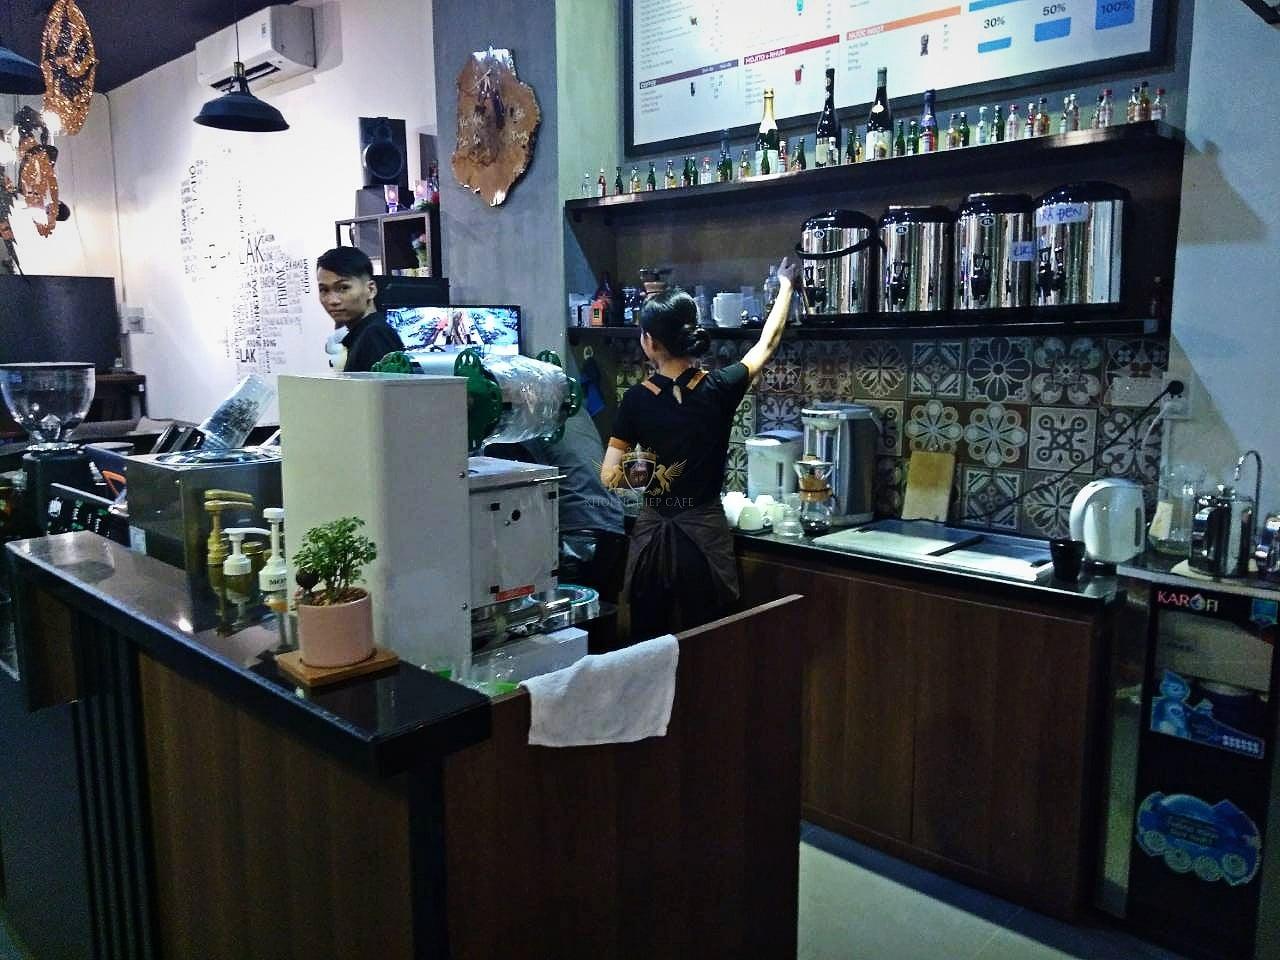 Dom Cafe Go Vap mua ban may pha cafe chuyen nghiep cua y Faema E98 RE A2 HC600 khoi nghiep cafe